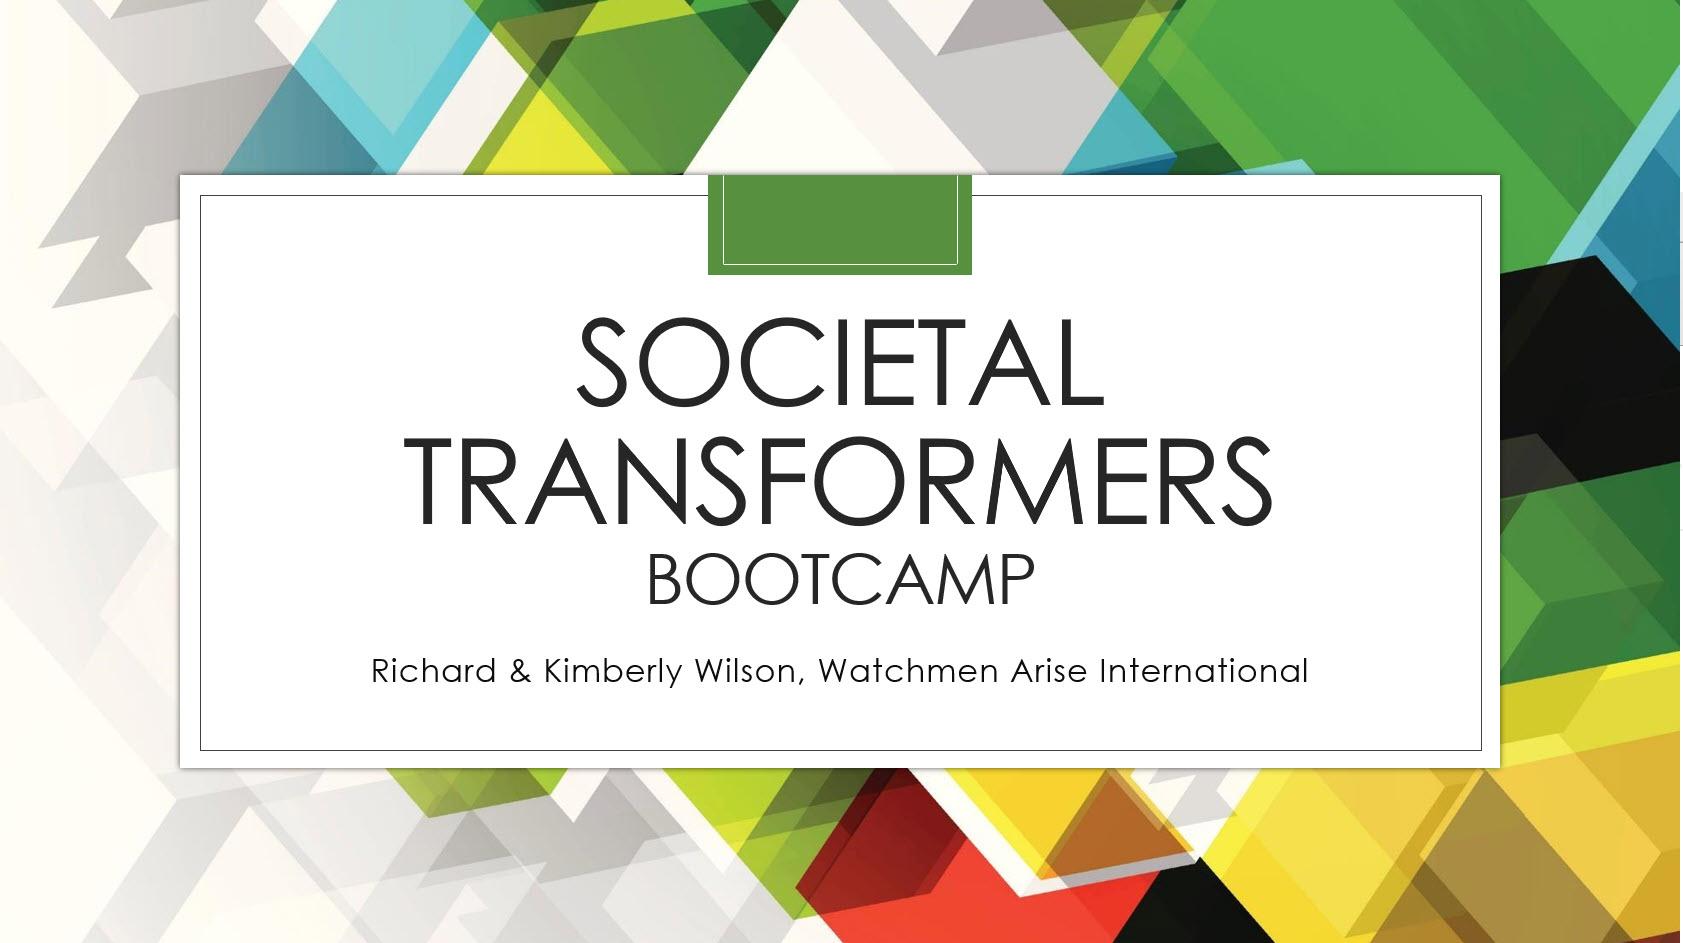 Societal Transformers Bootcamp